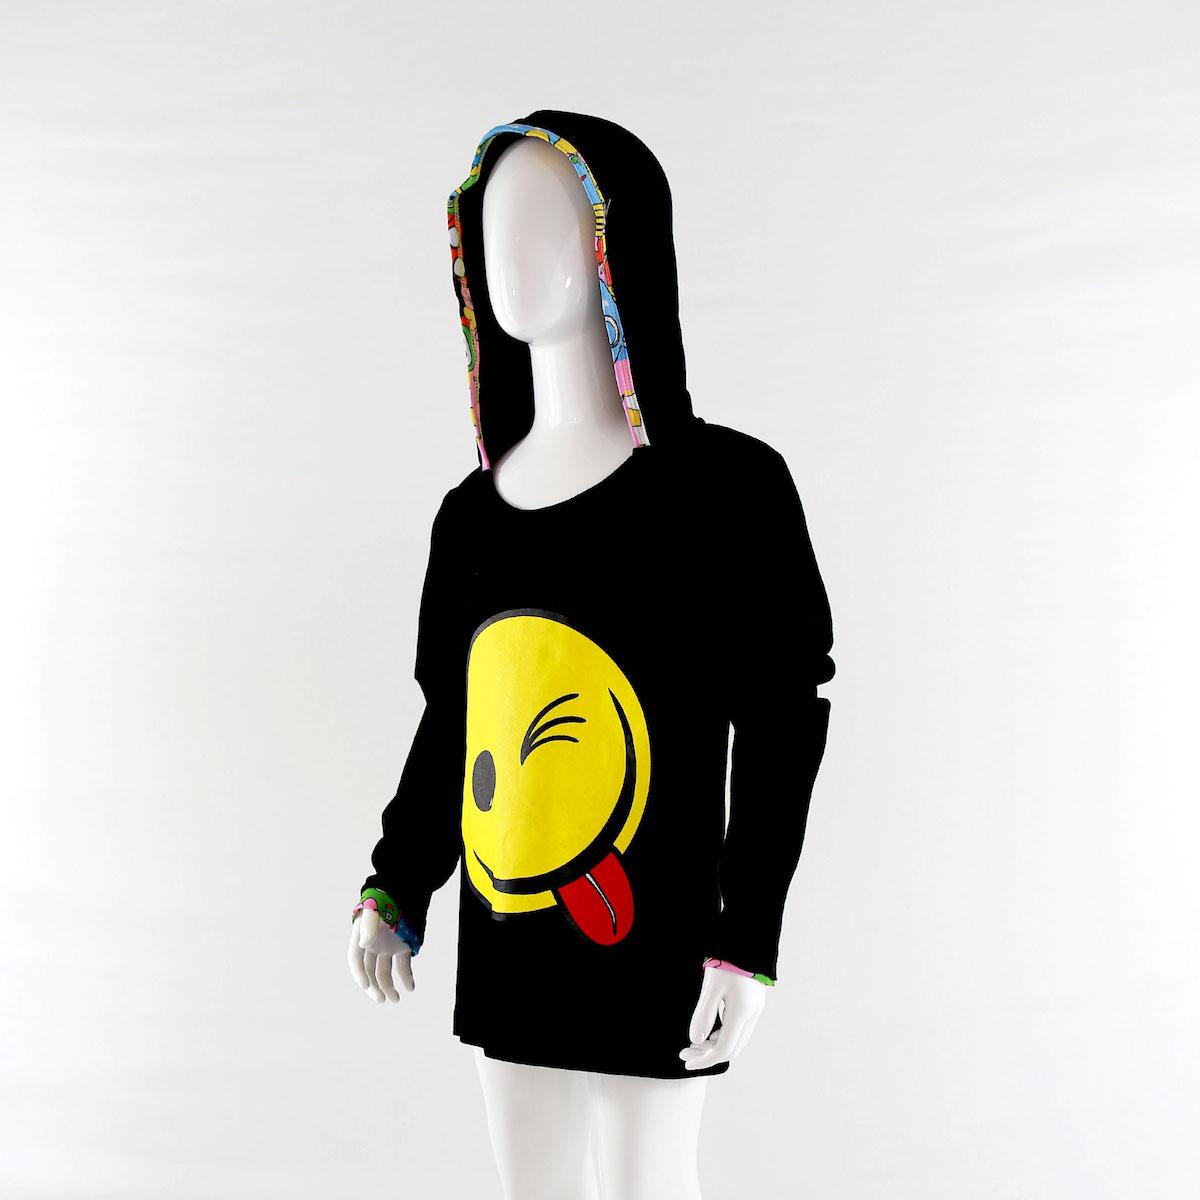 Graphic Sweatshirts For Boys, Cool Sweatshirts Boys